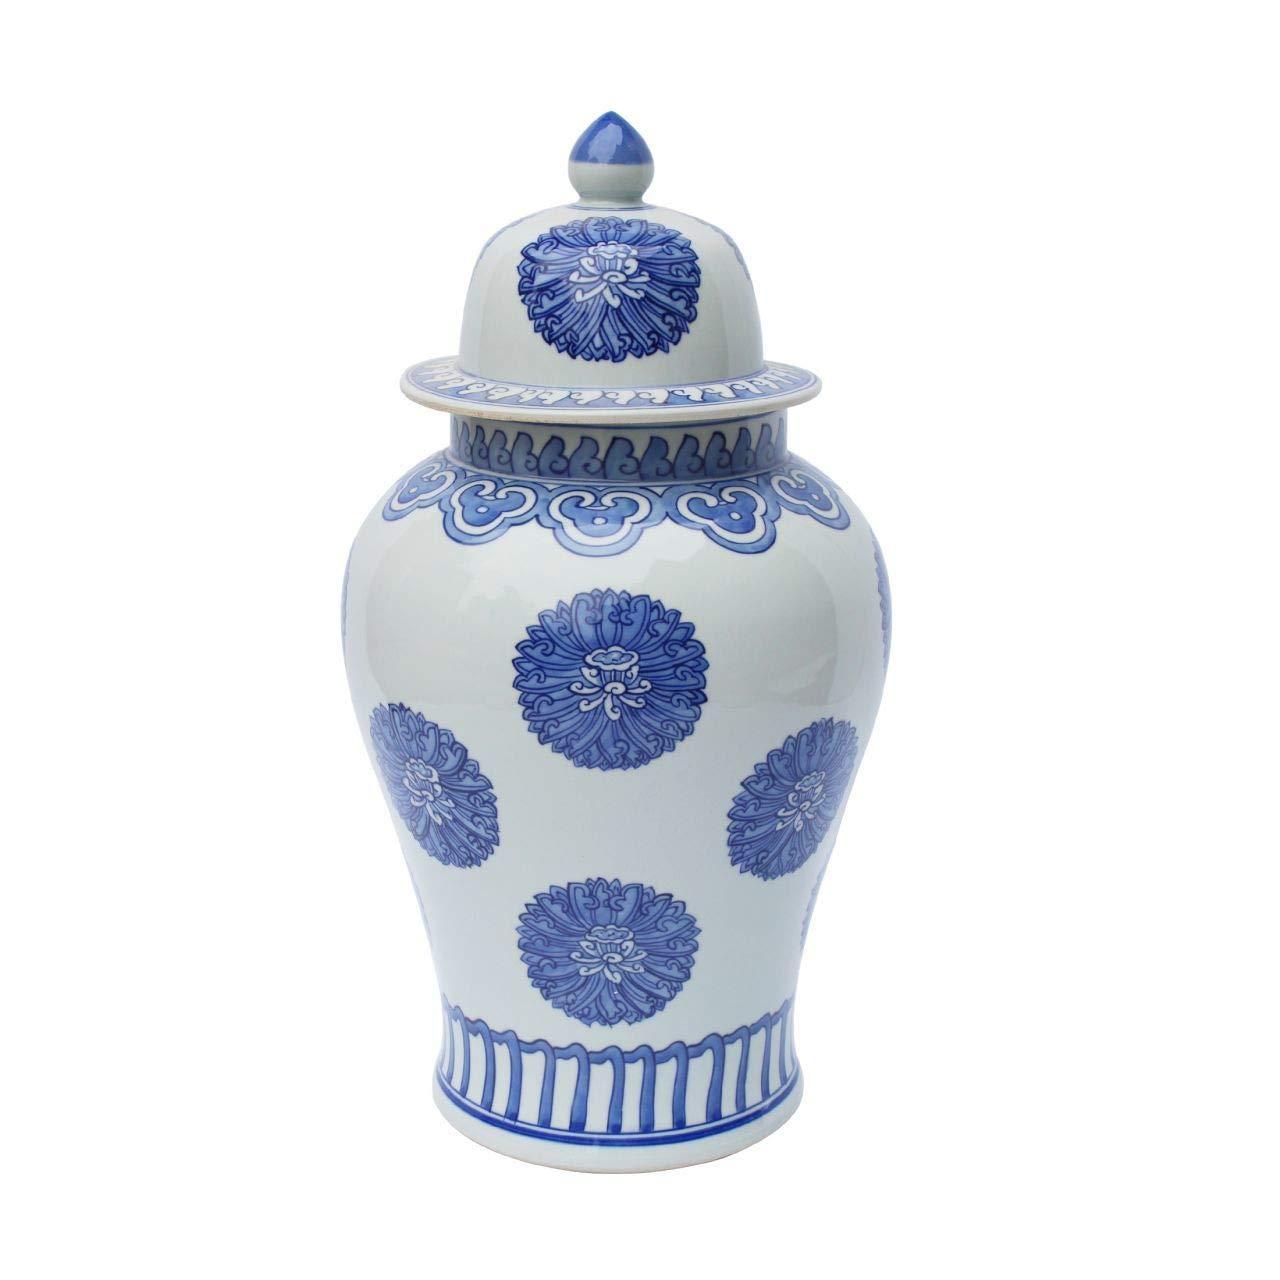 Legends of Asia Asian Decorative Blue & White Multi Flowers Temple Porcelain Decorative Jar